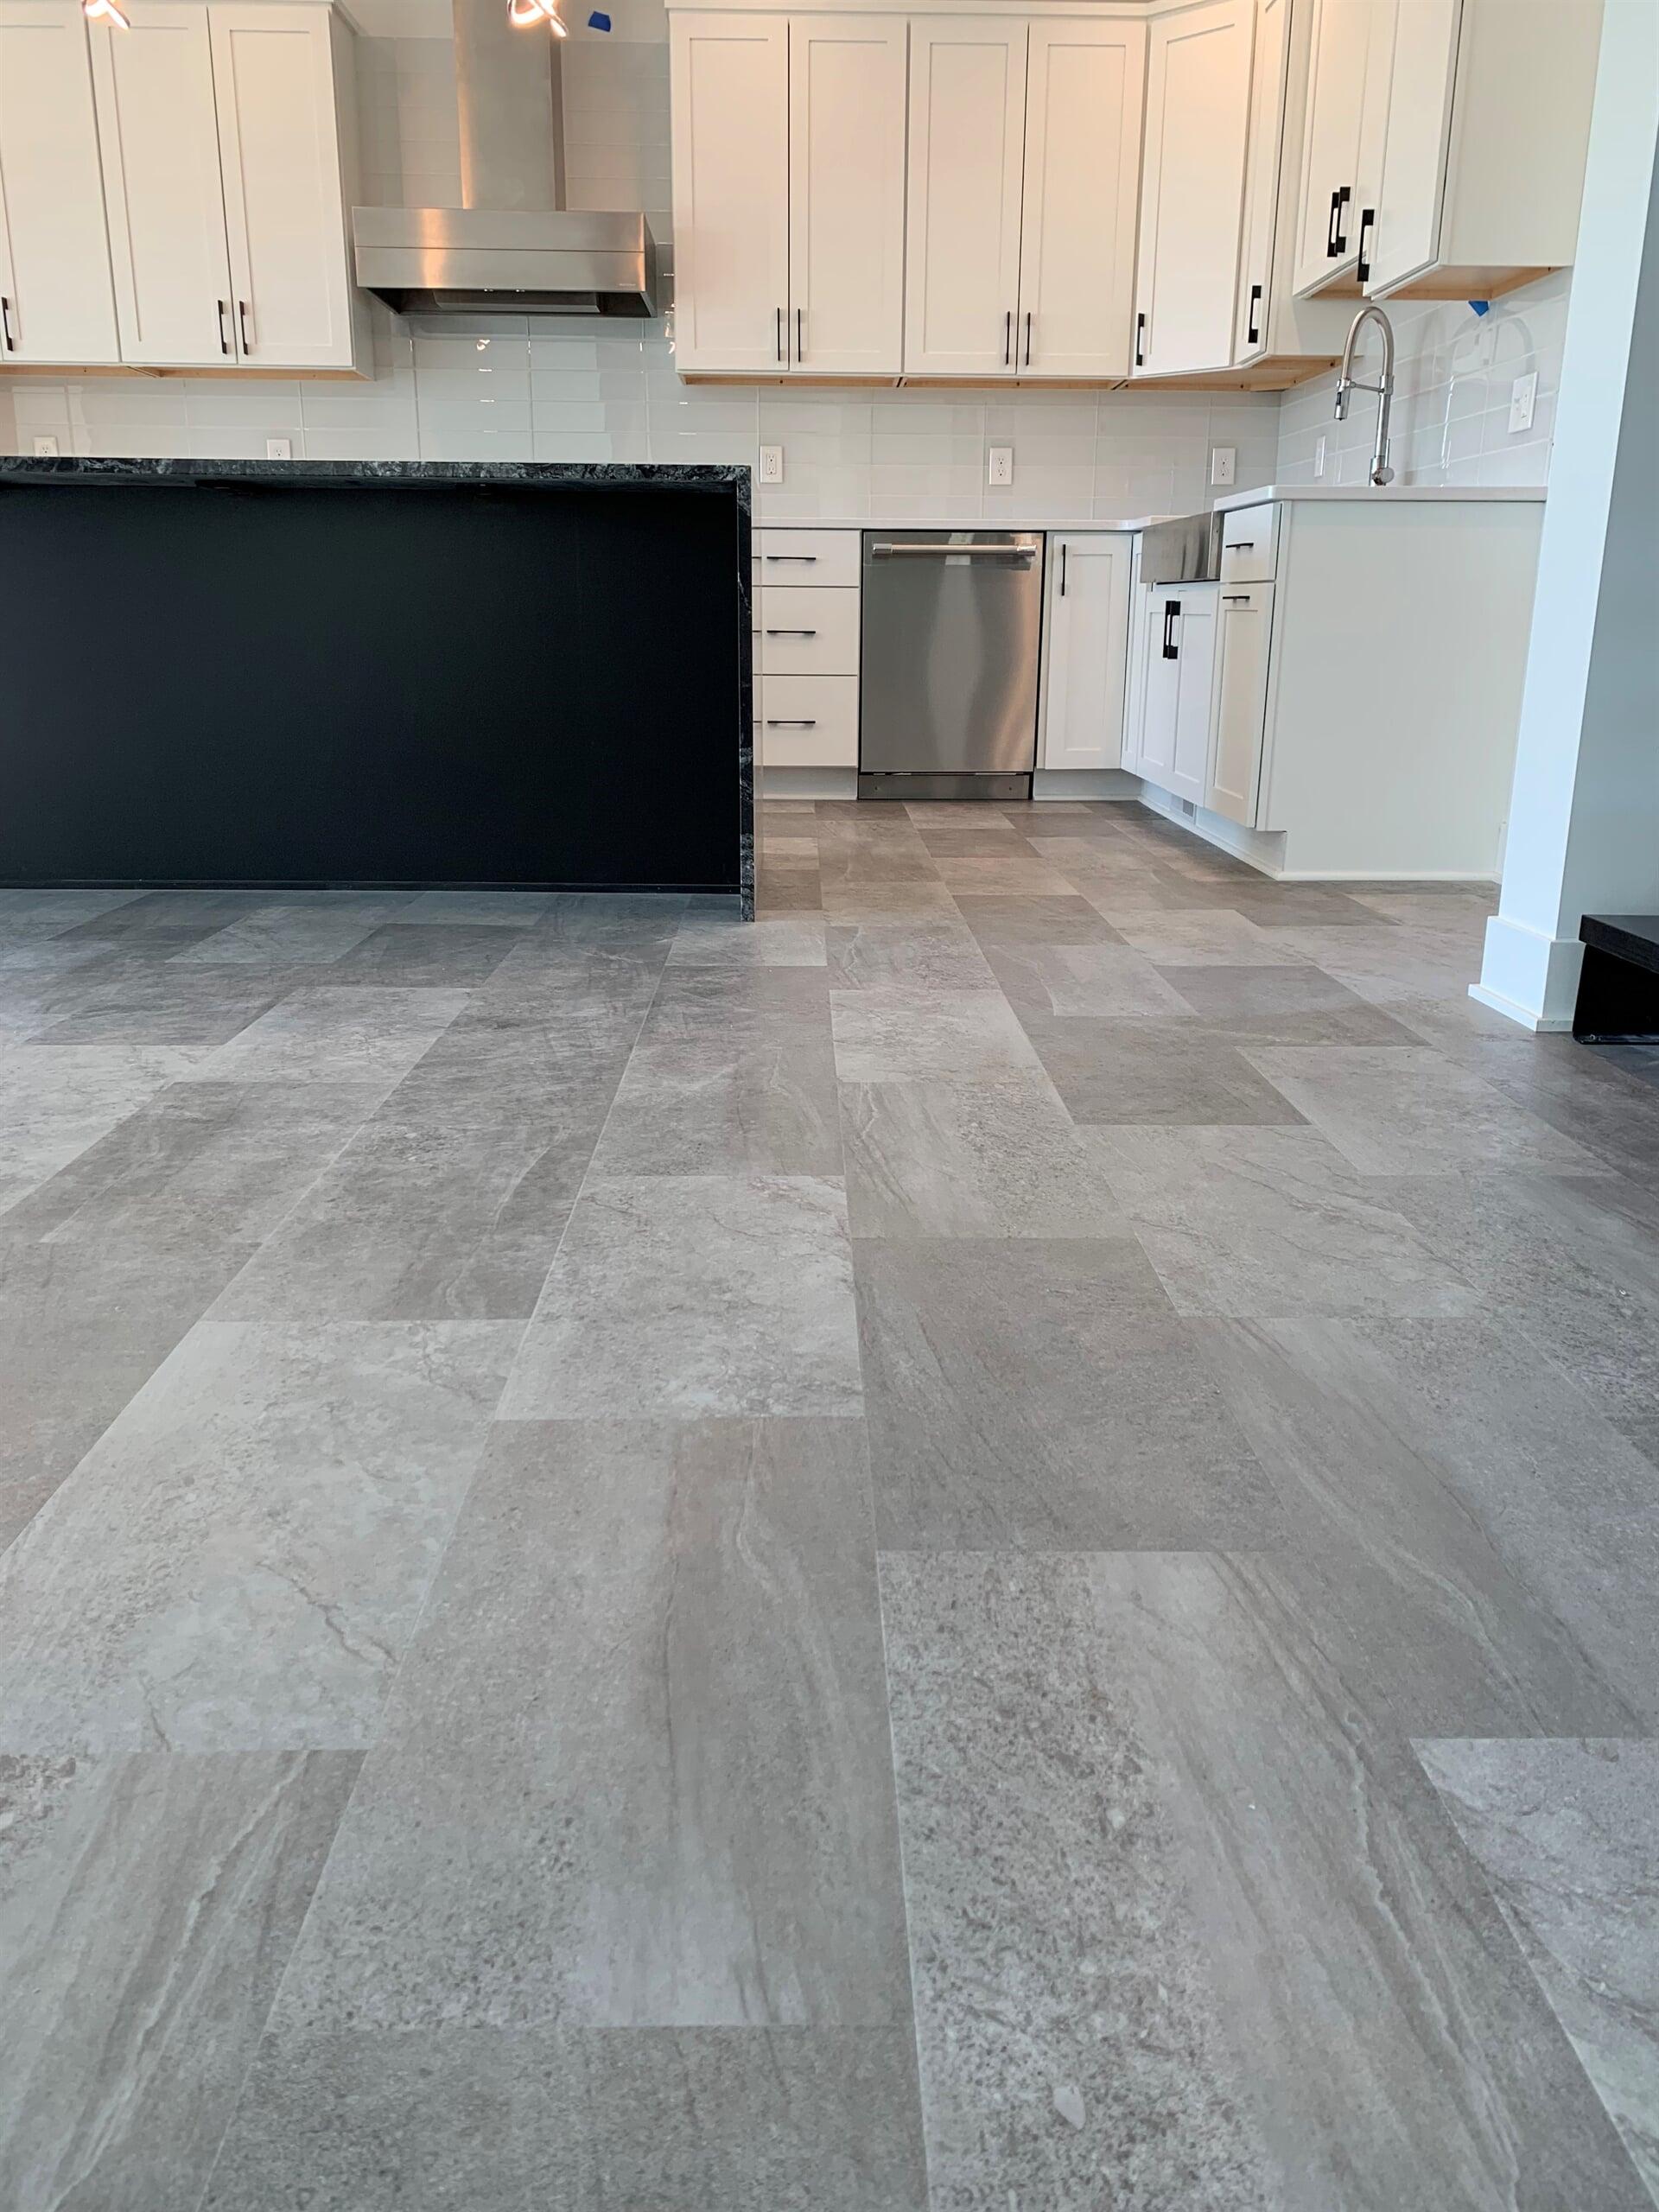 Luxury vinyl tile flooring in Hudsonville, MI from Village Custom Interiors